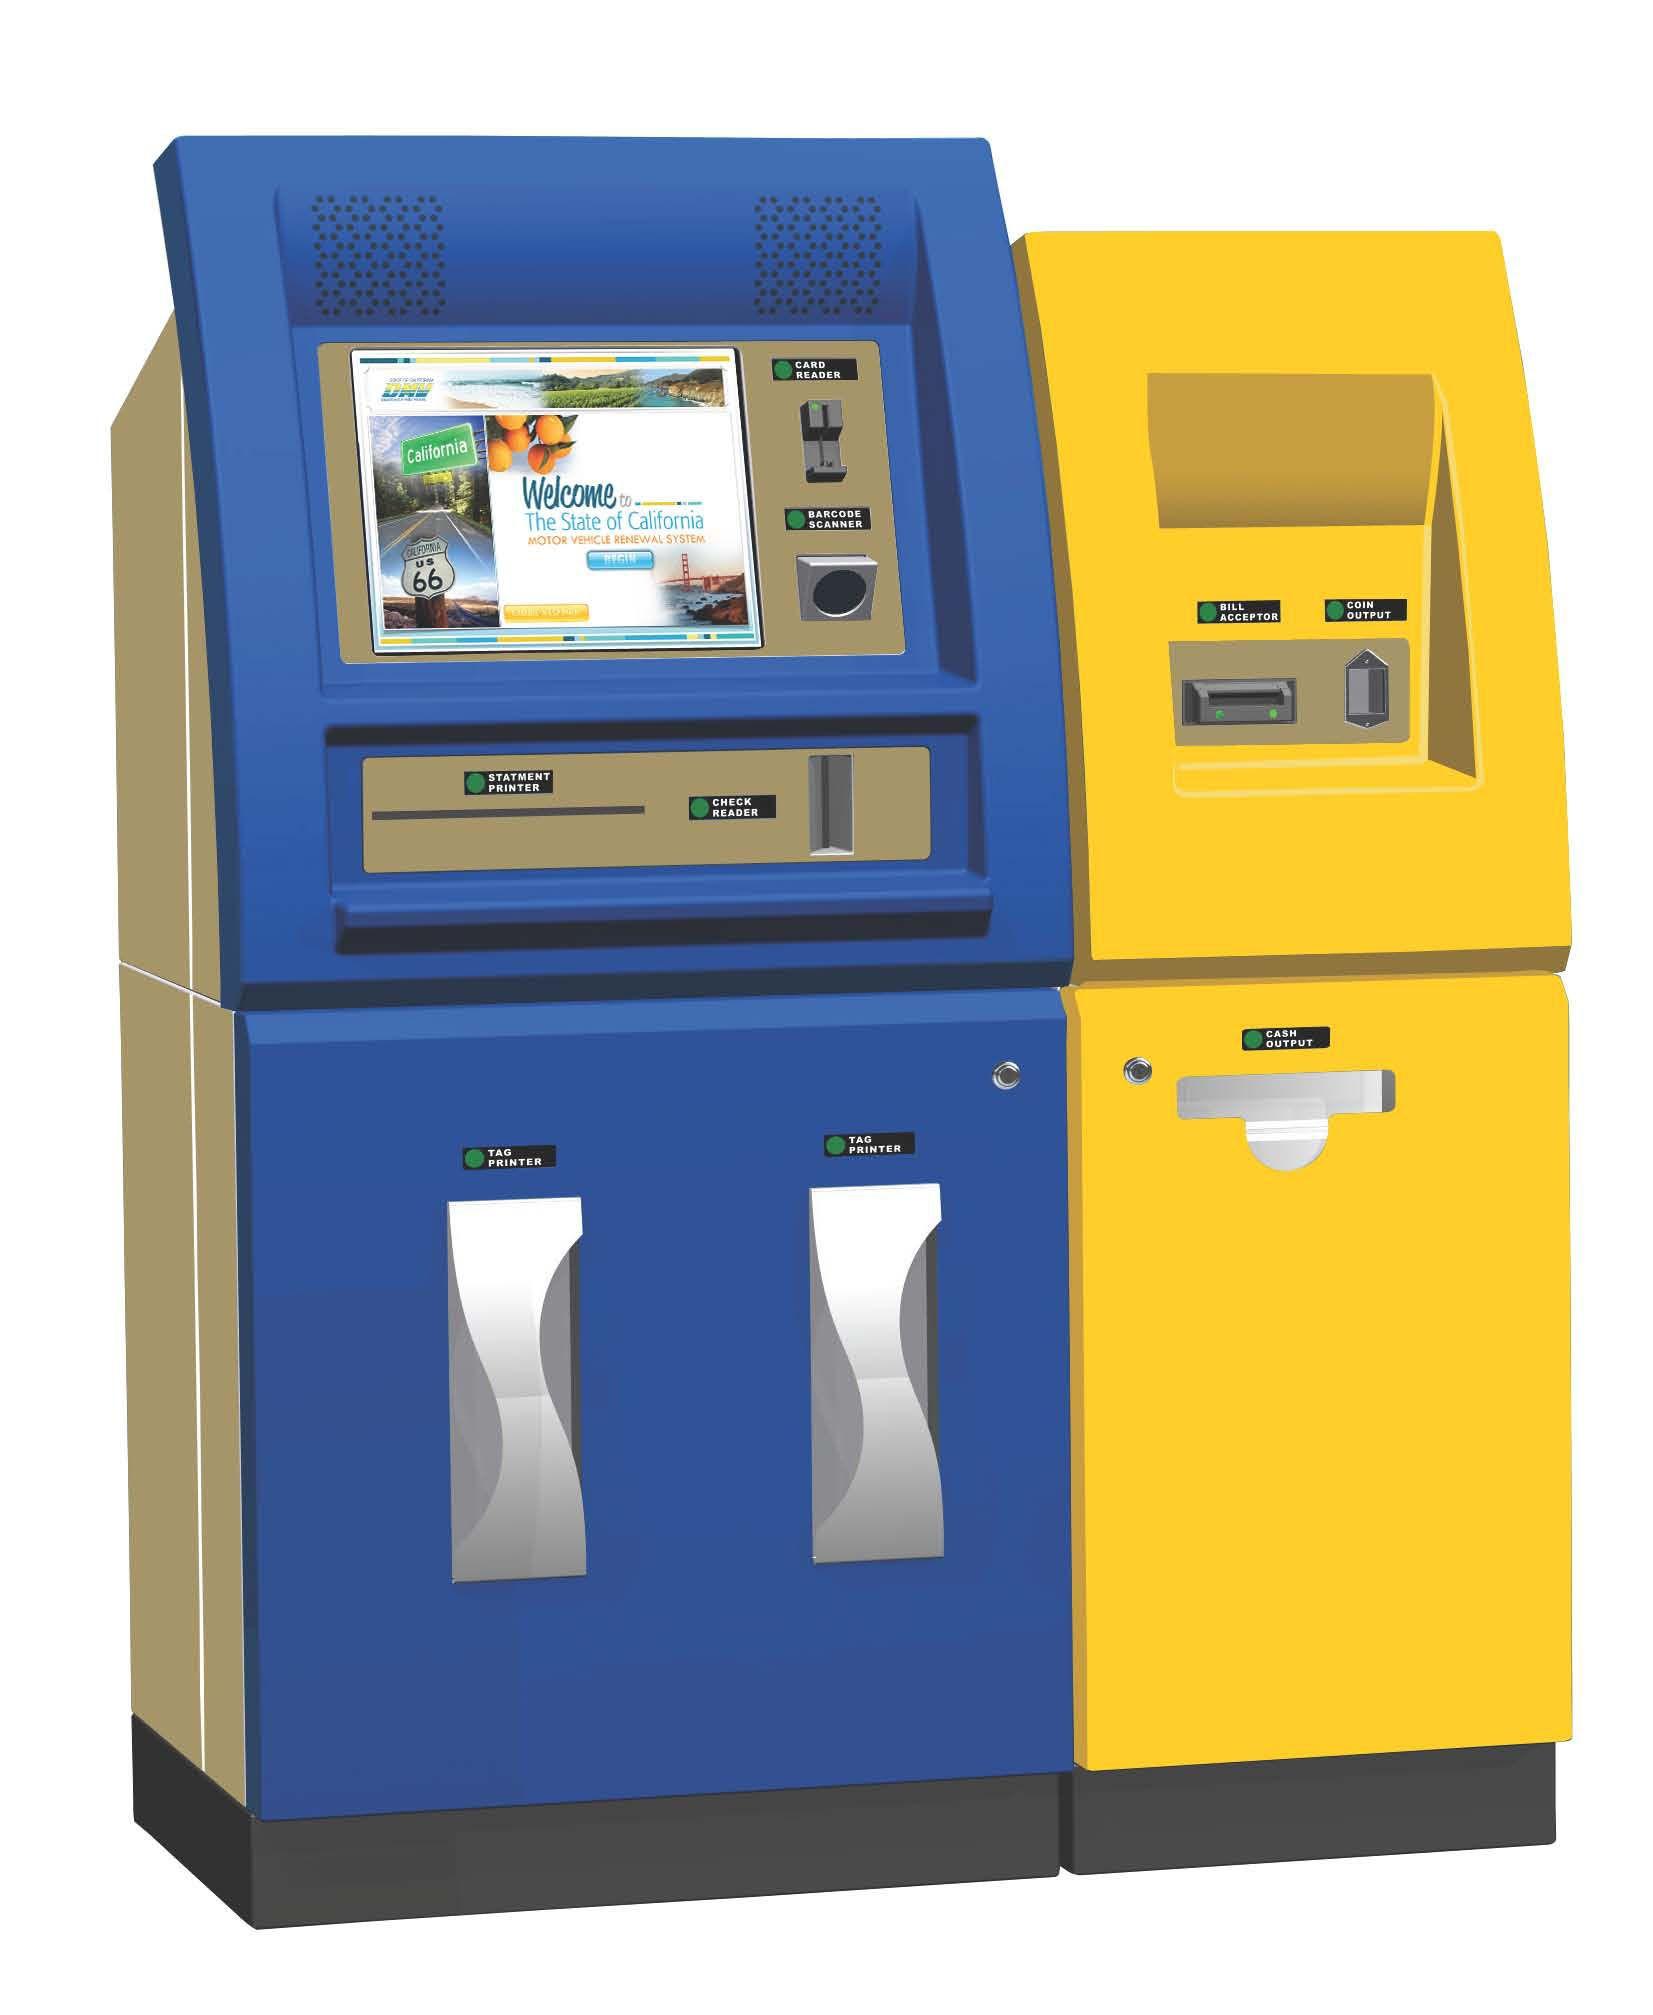 Timesaving Self Service Terminals Installed at more DMV